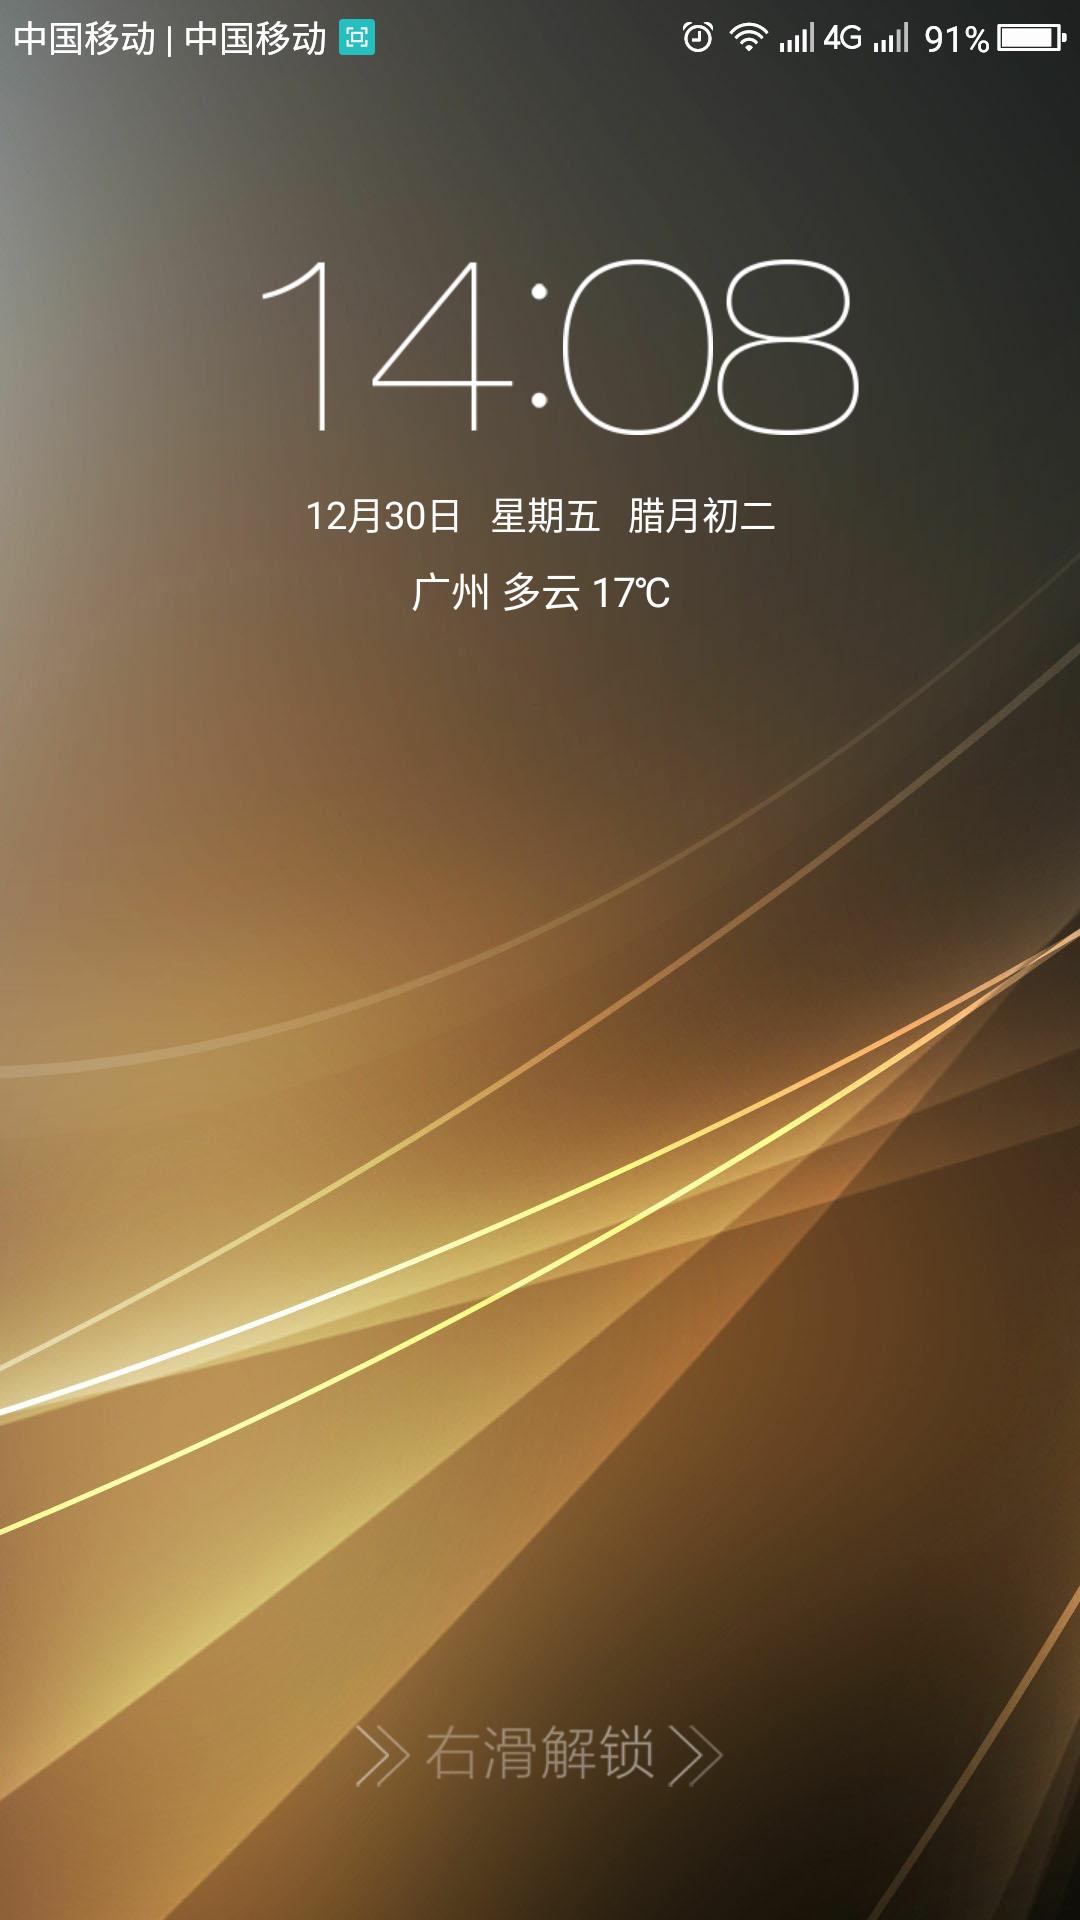 Screenshot_2016-12-30-14-09-01.png